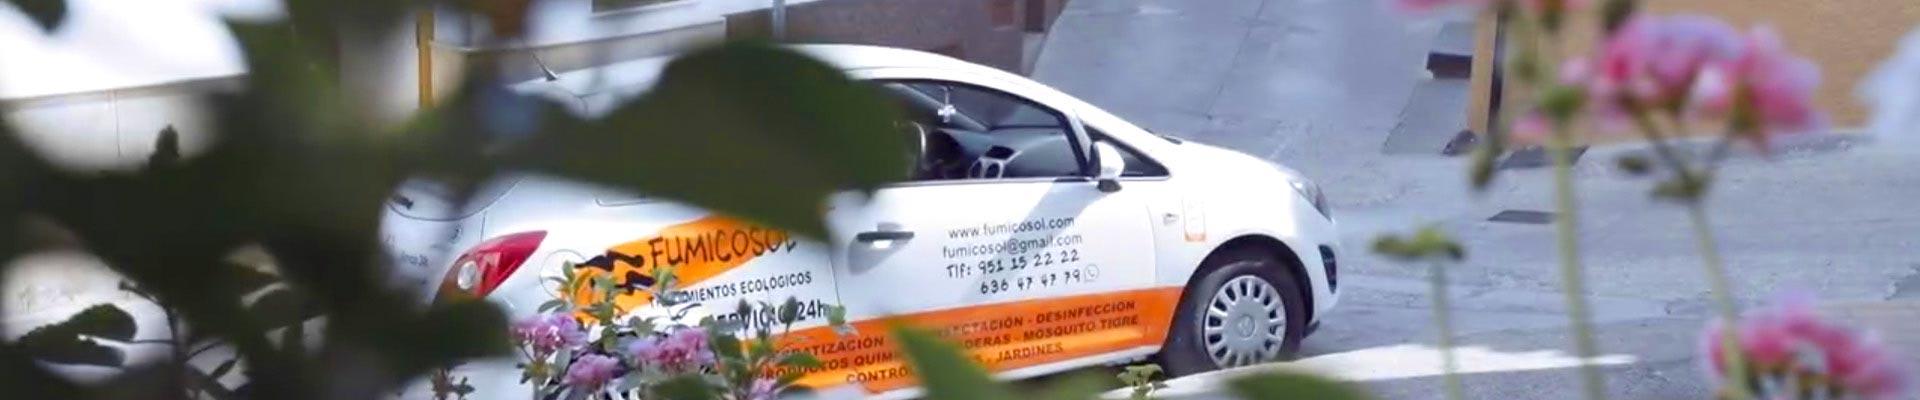 empresa de control de plagas en fuengirola